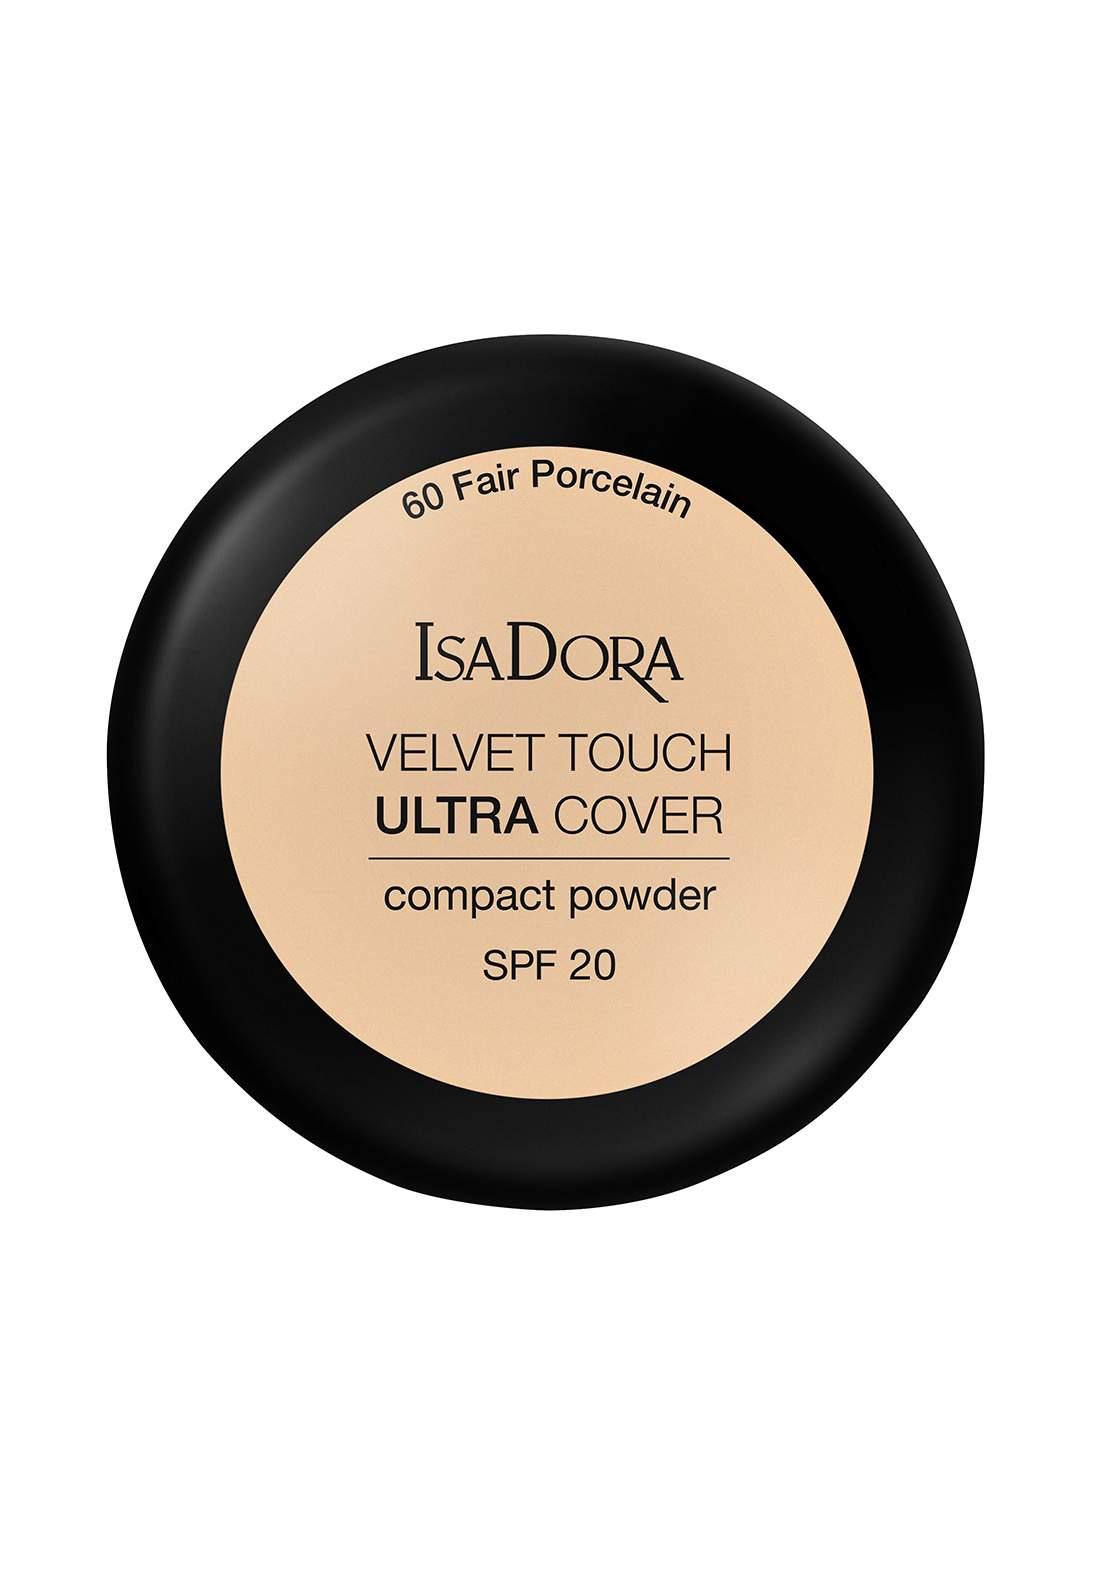 IsaDora 317111 Velvet Touch Sheer Cover Compact Powder Fair Porcelain SPF 20 NO.60 باودر